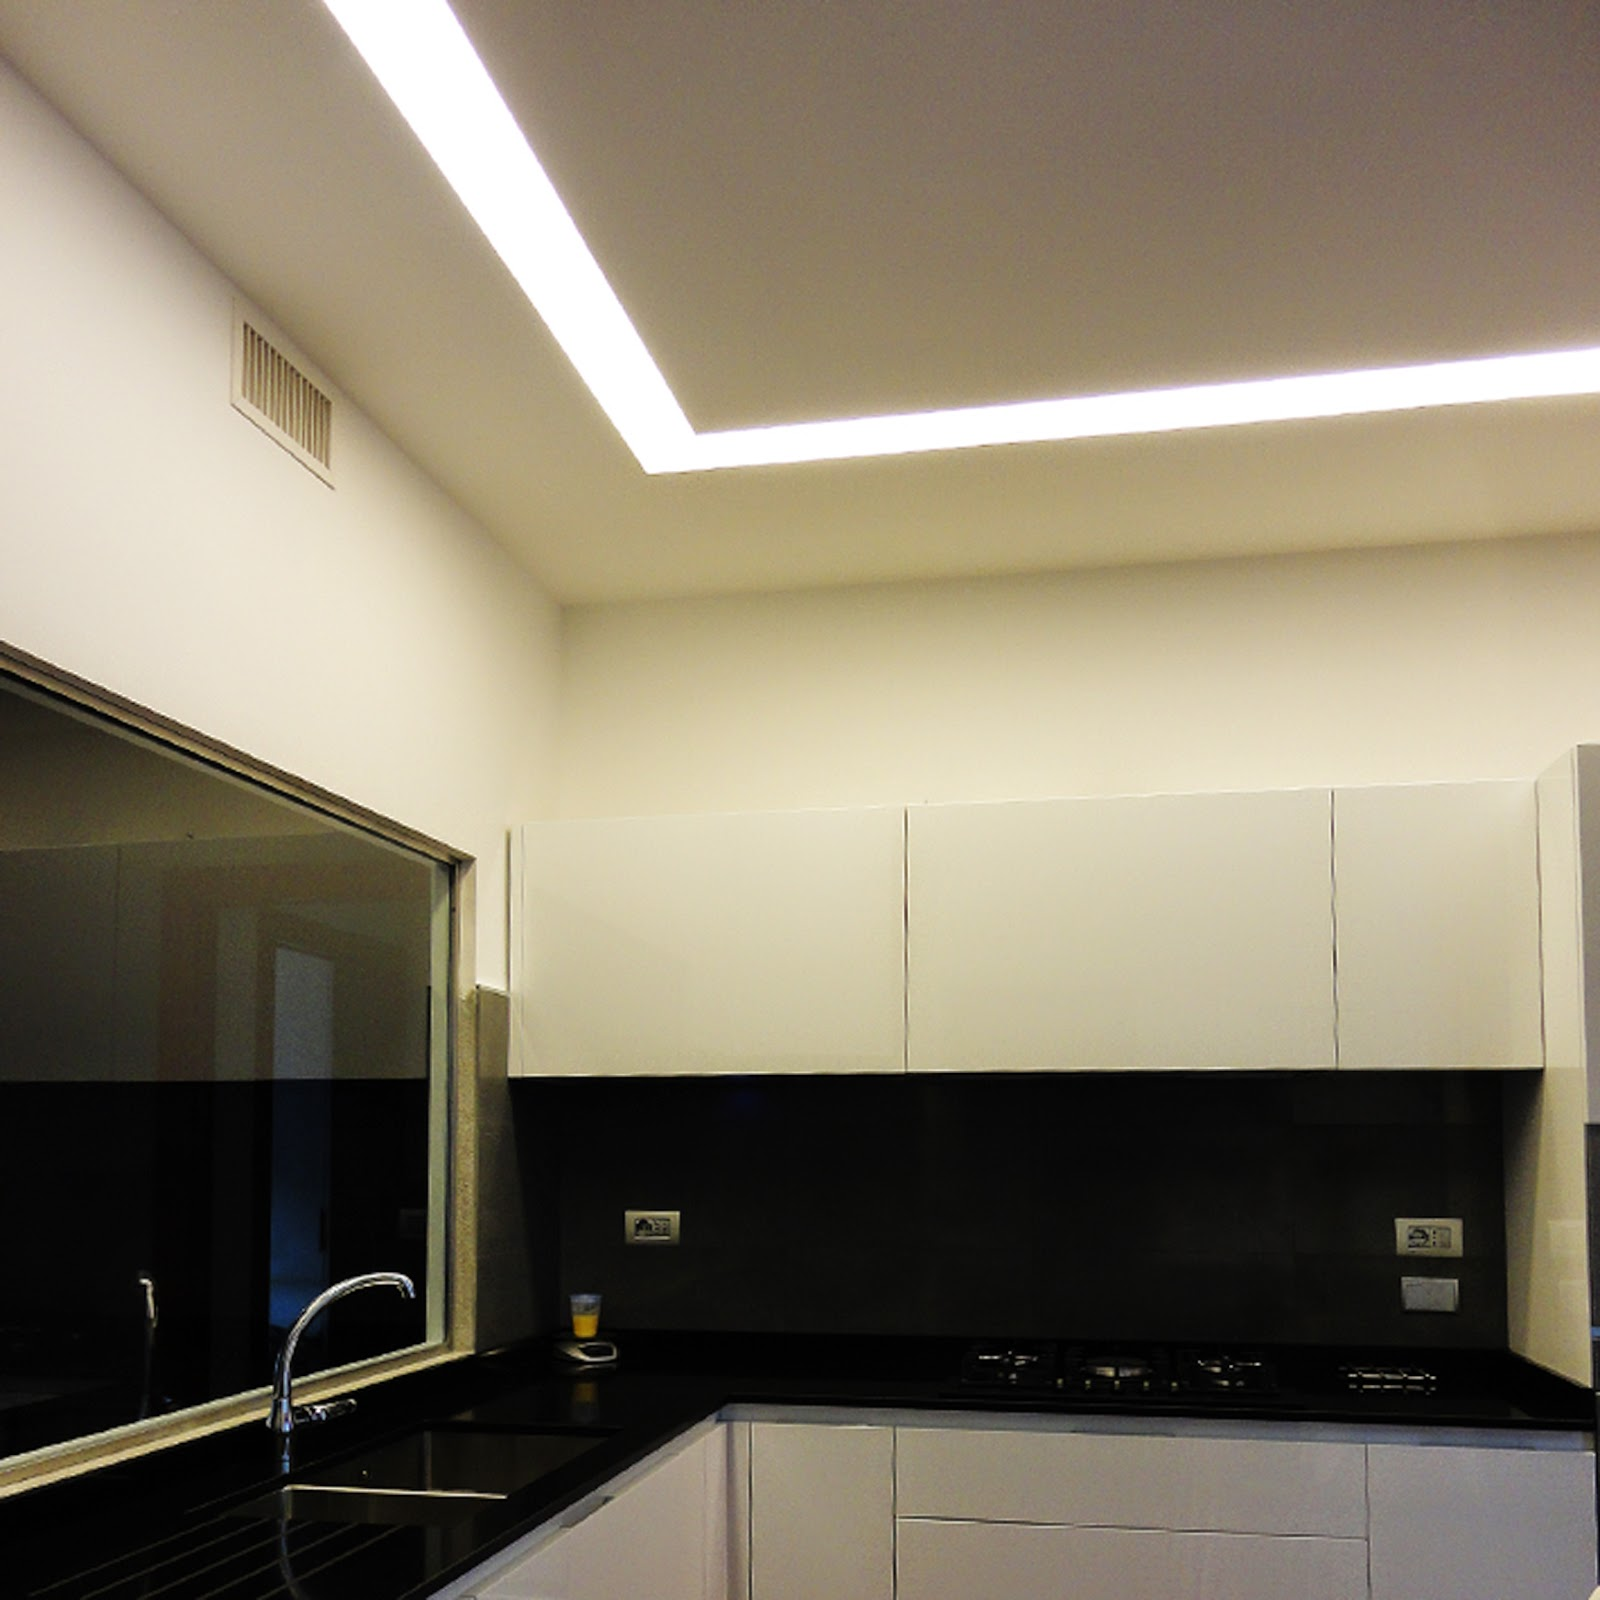 Illuminazione led casa 2014 - Illuminazione scale a led ...